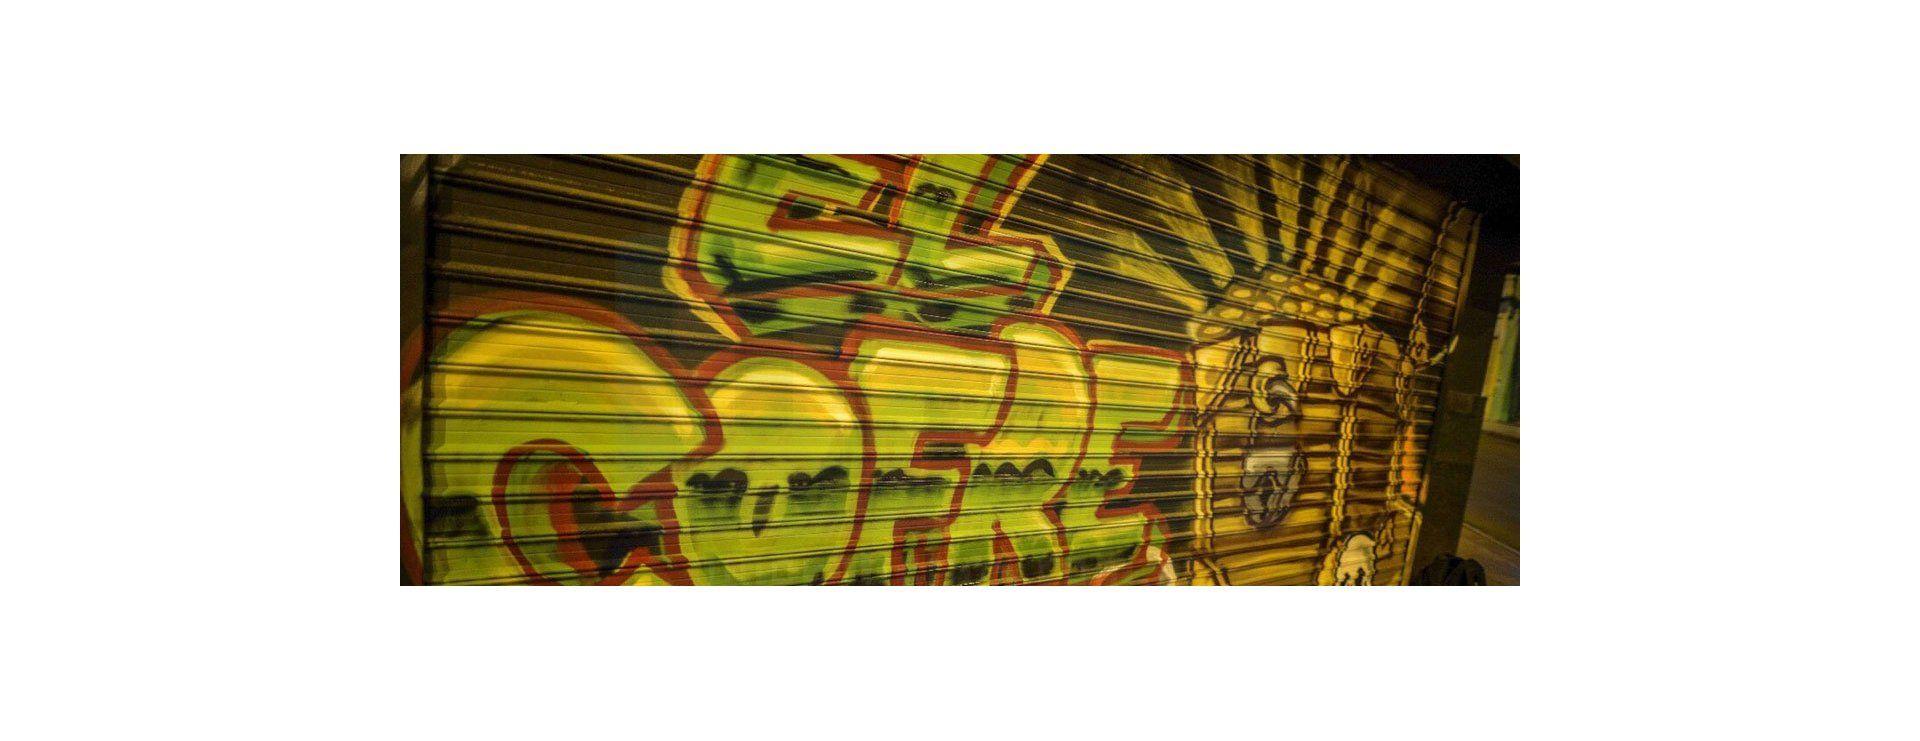 Los graffitis de Facundo Sánchez